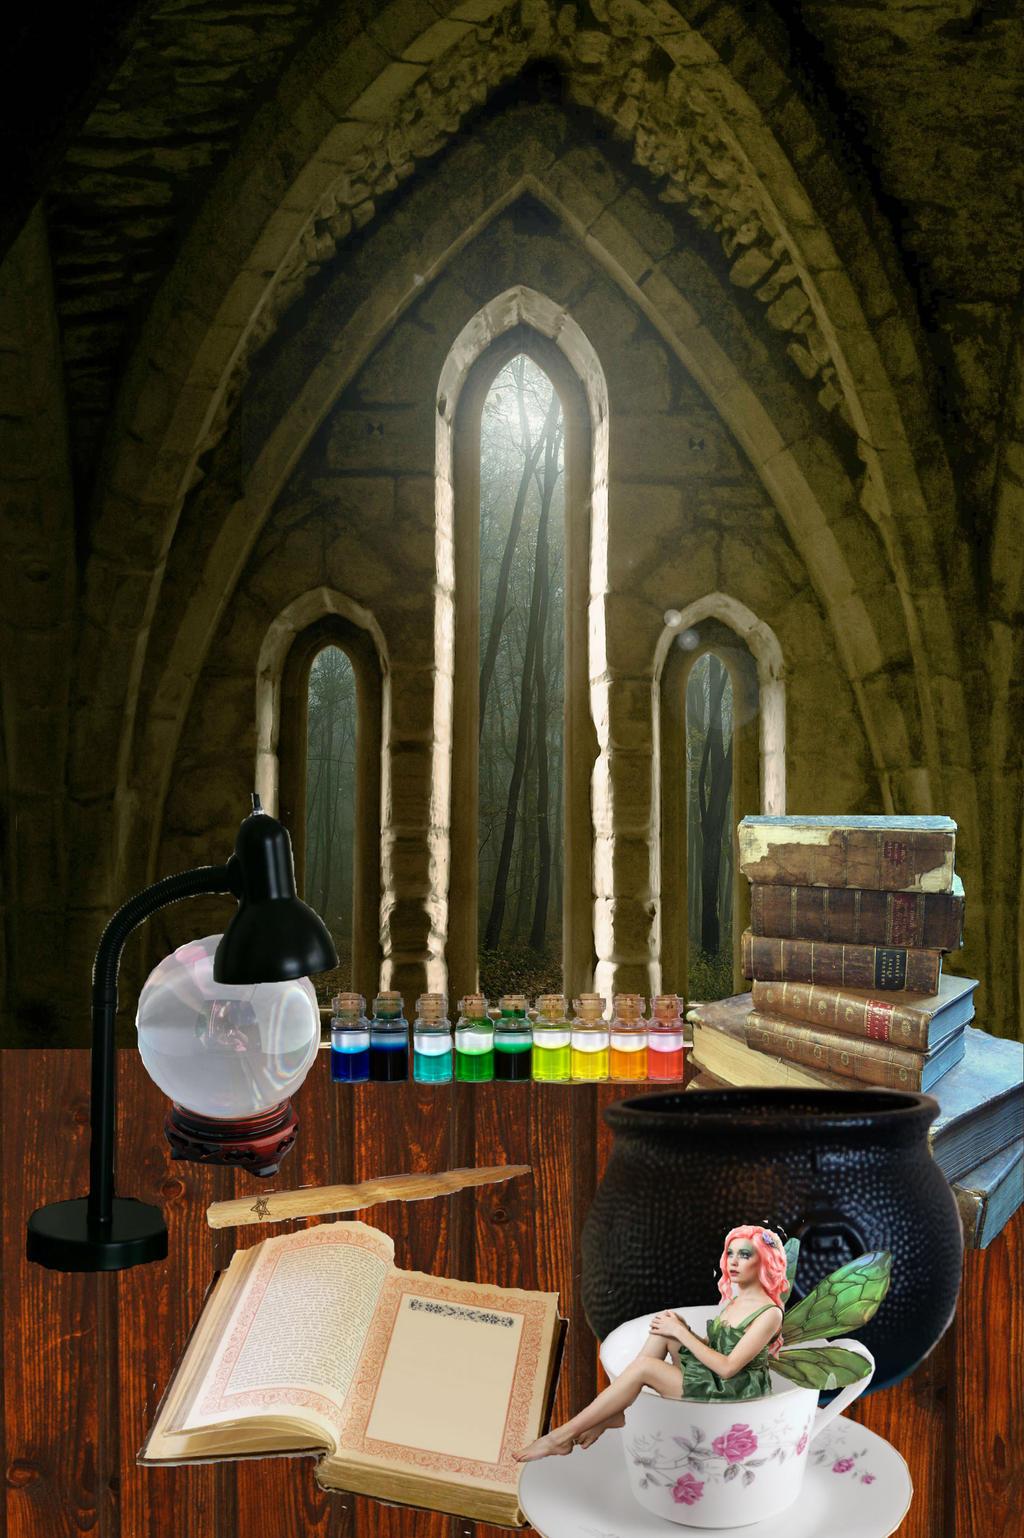 Witch's Desk